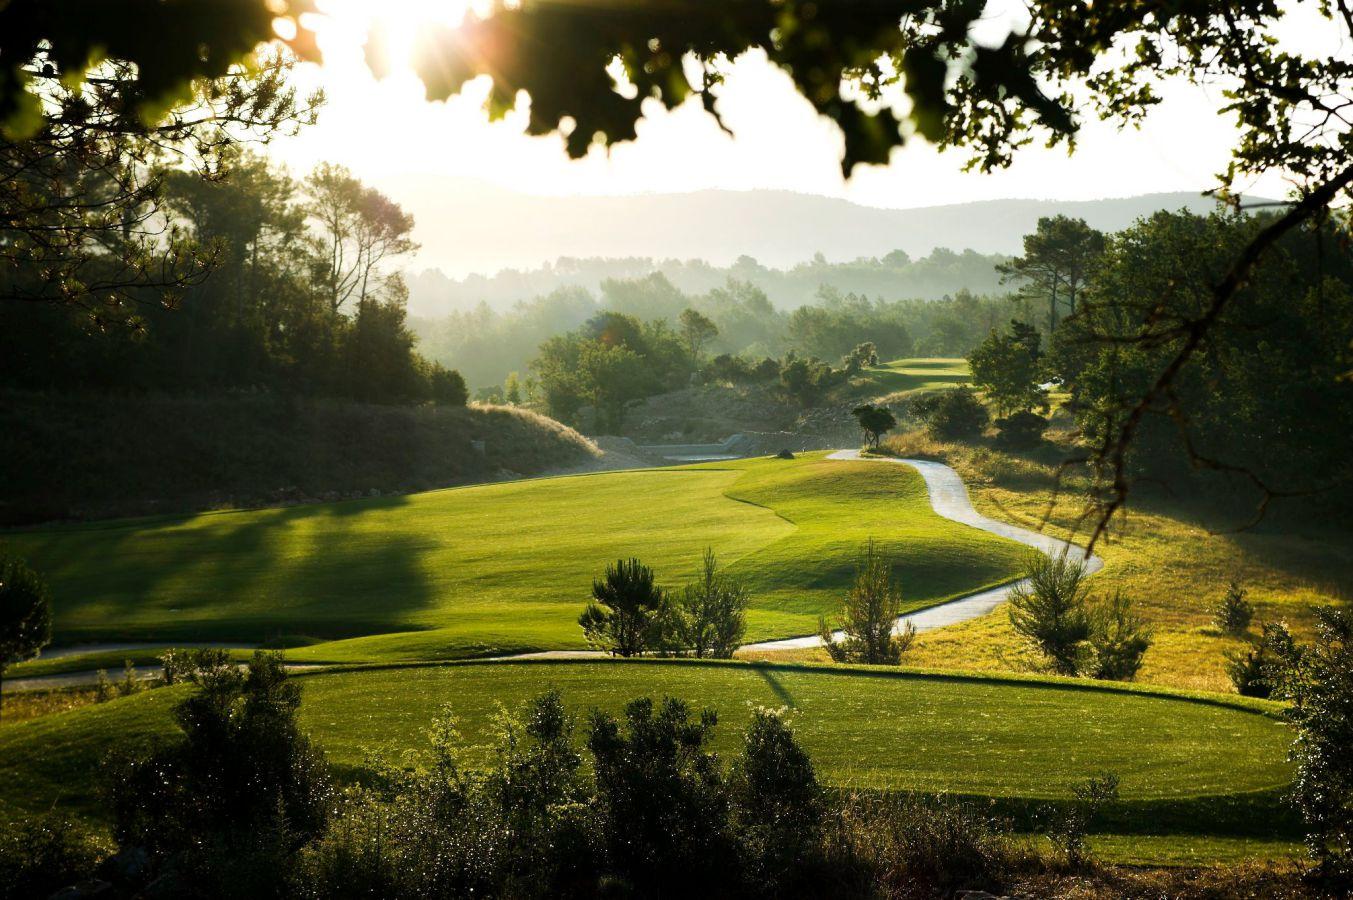 terre-blance-golf-064